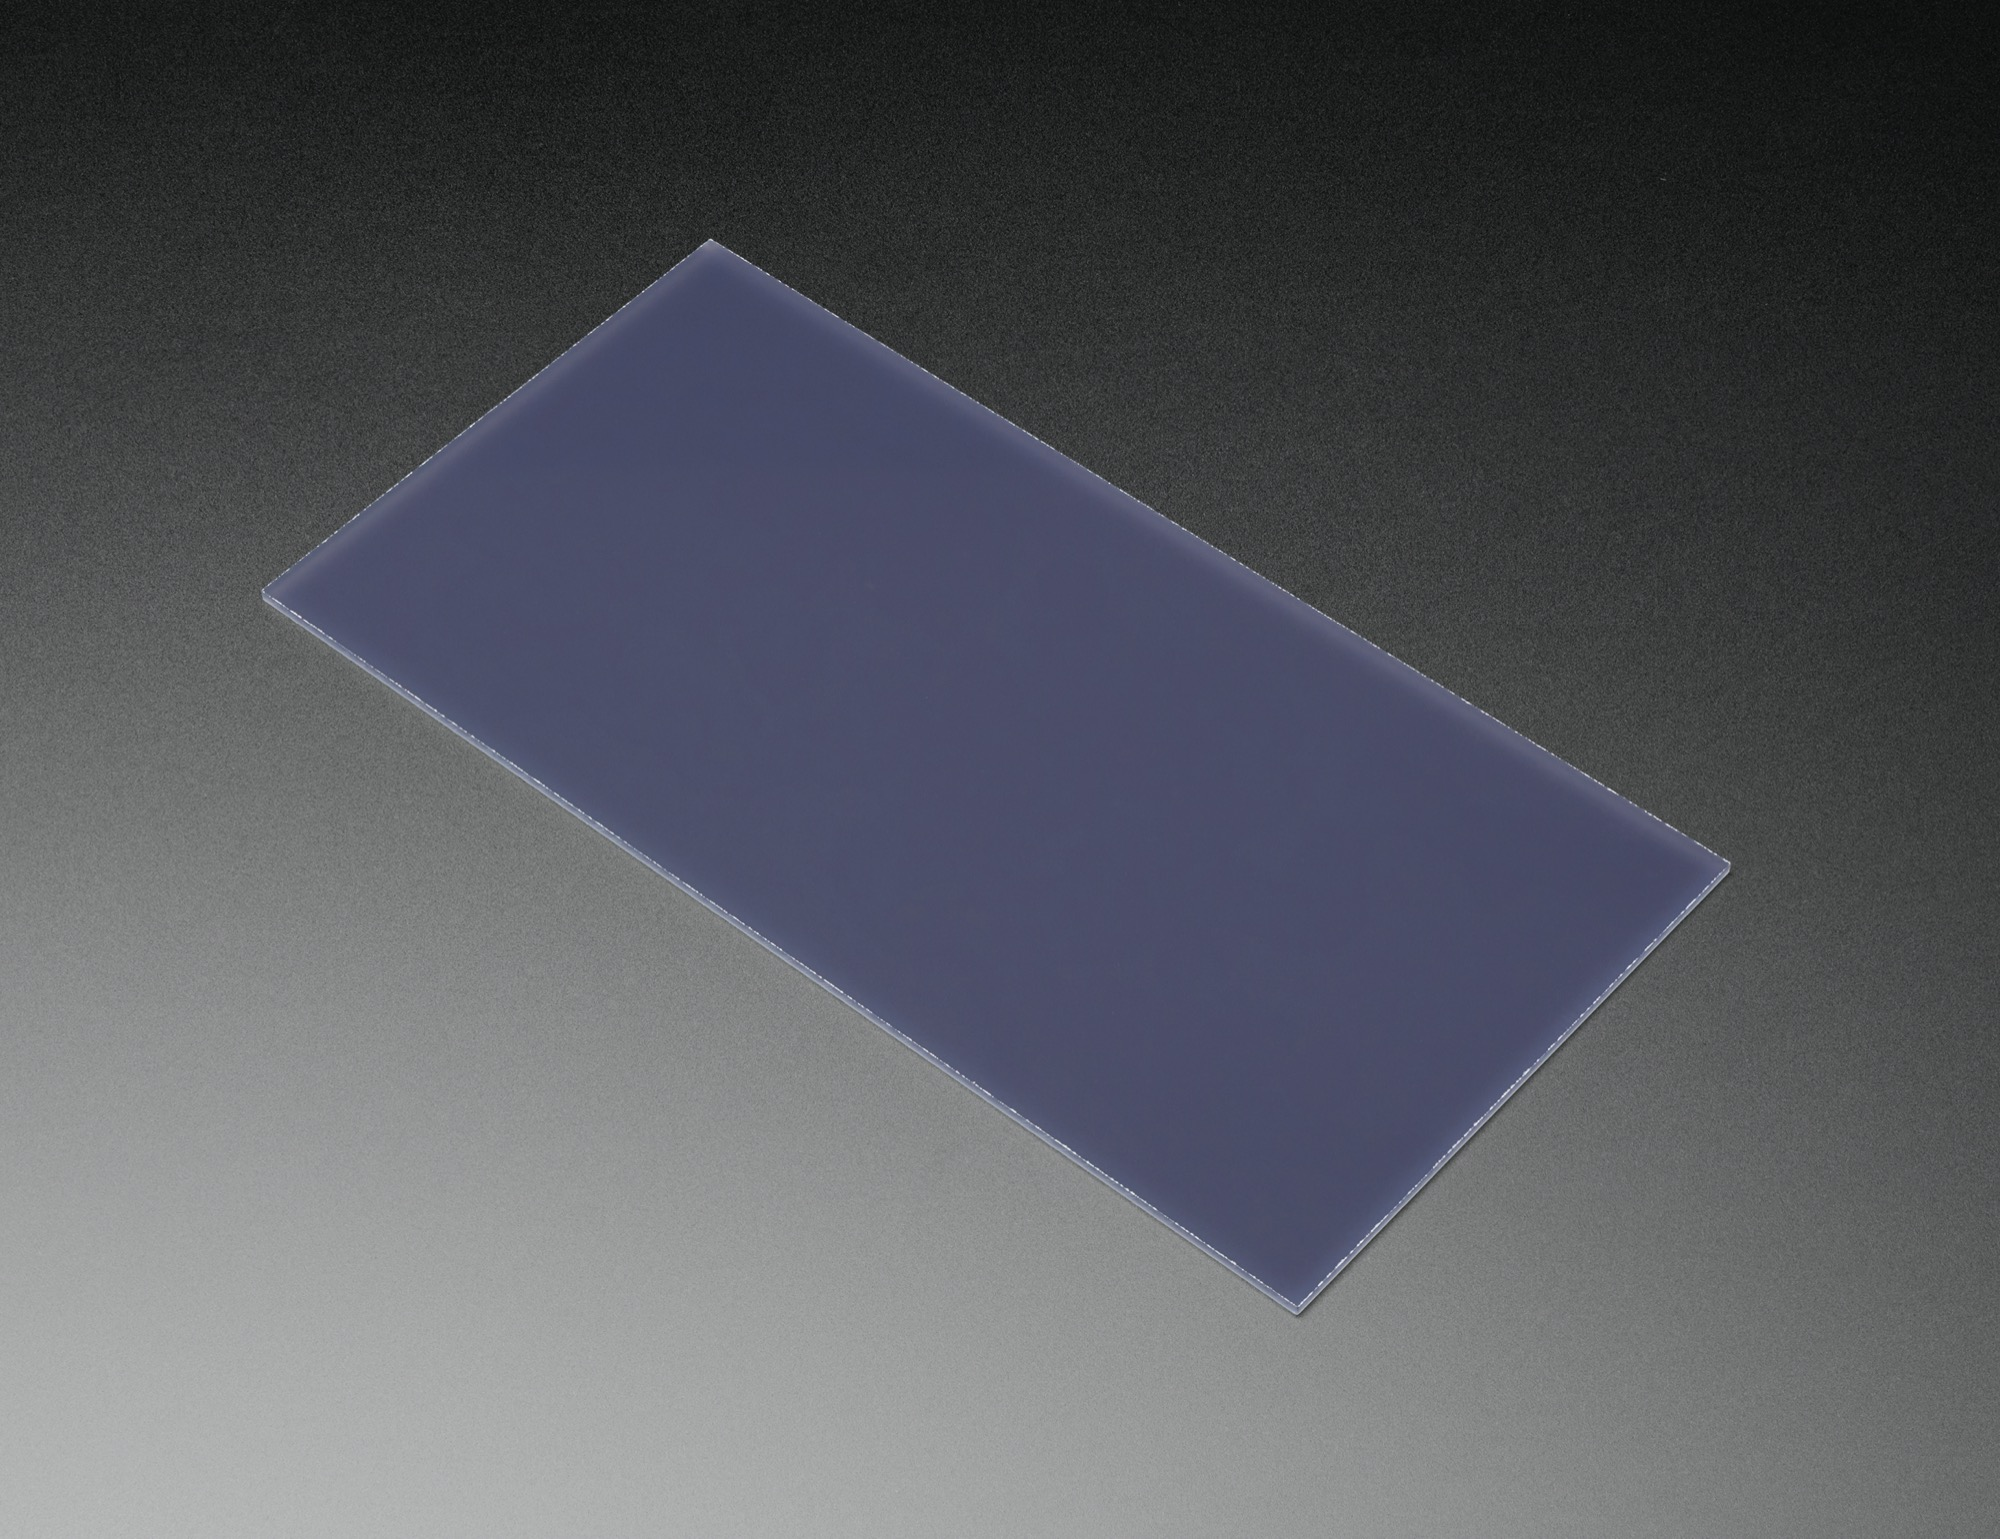 led_matrices_black_diffusion_acrylic_2k.jpg